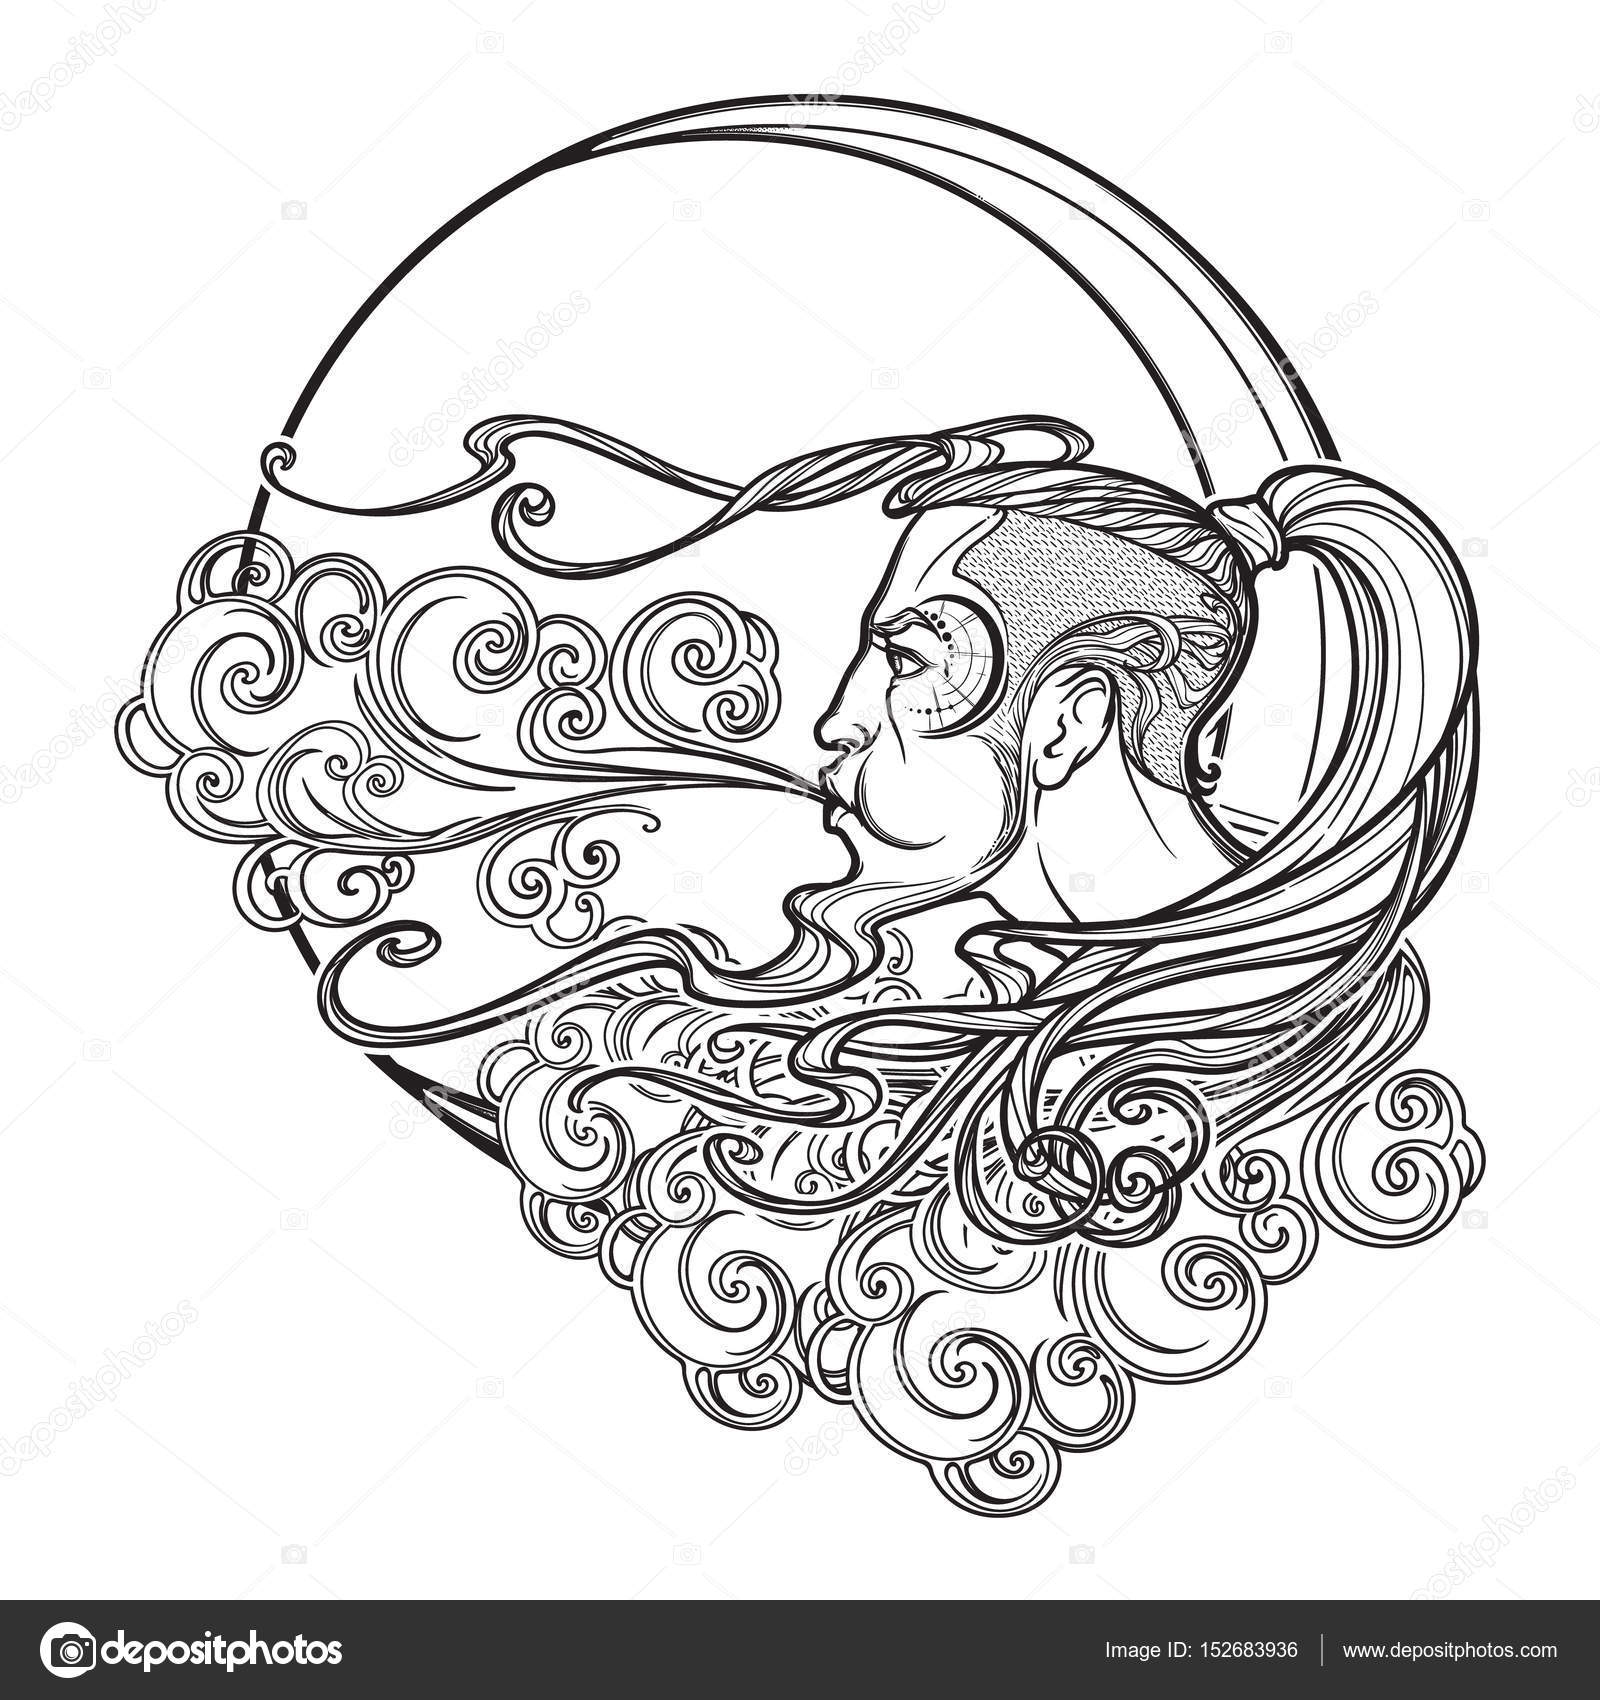 Antique style cartography Boreas wind icon. Male head